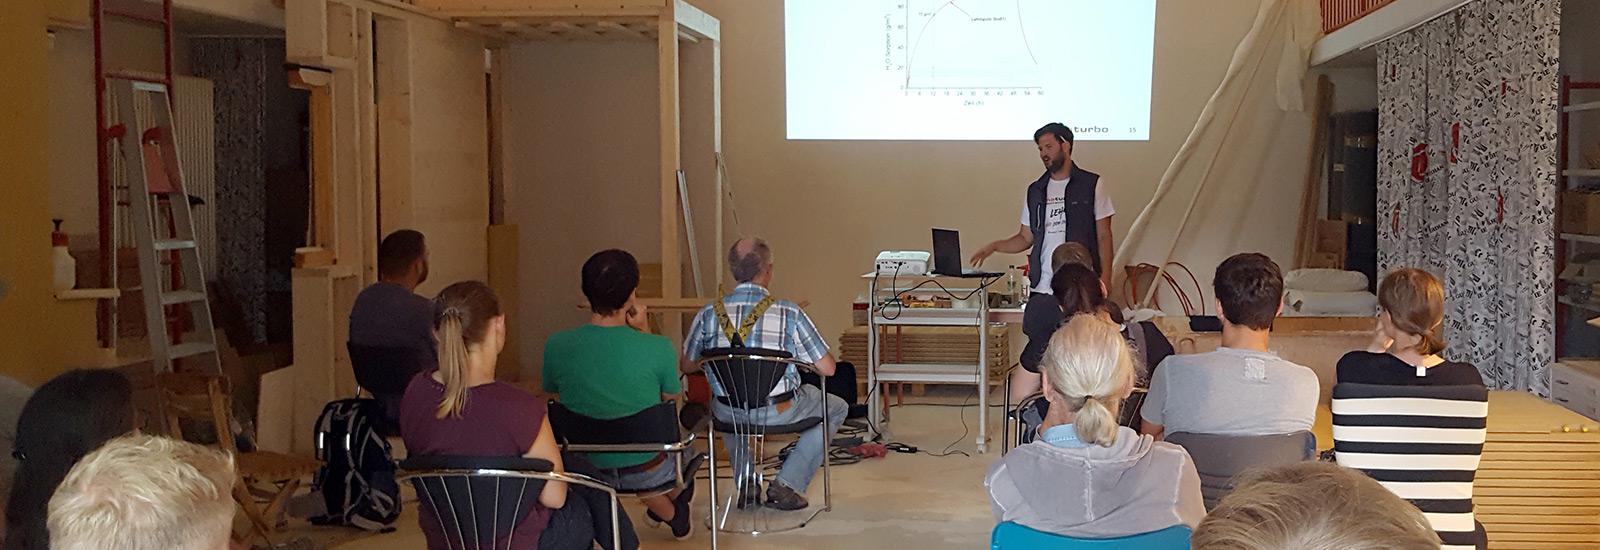 Workshop bei naturbo Lehmputz Trockenbausystemen